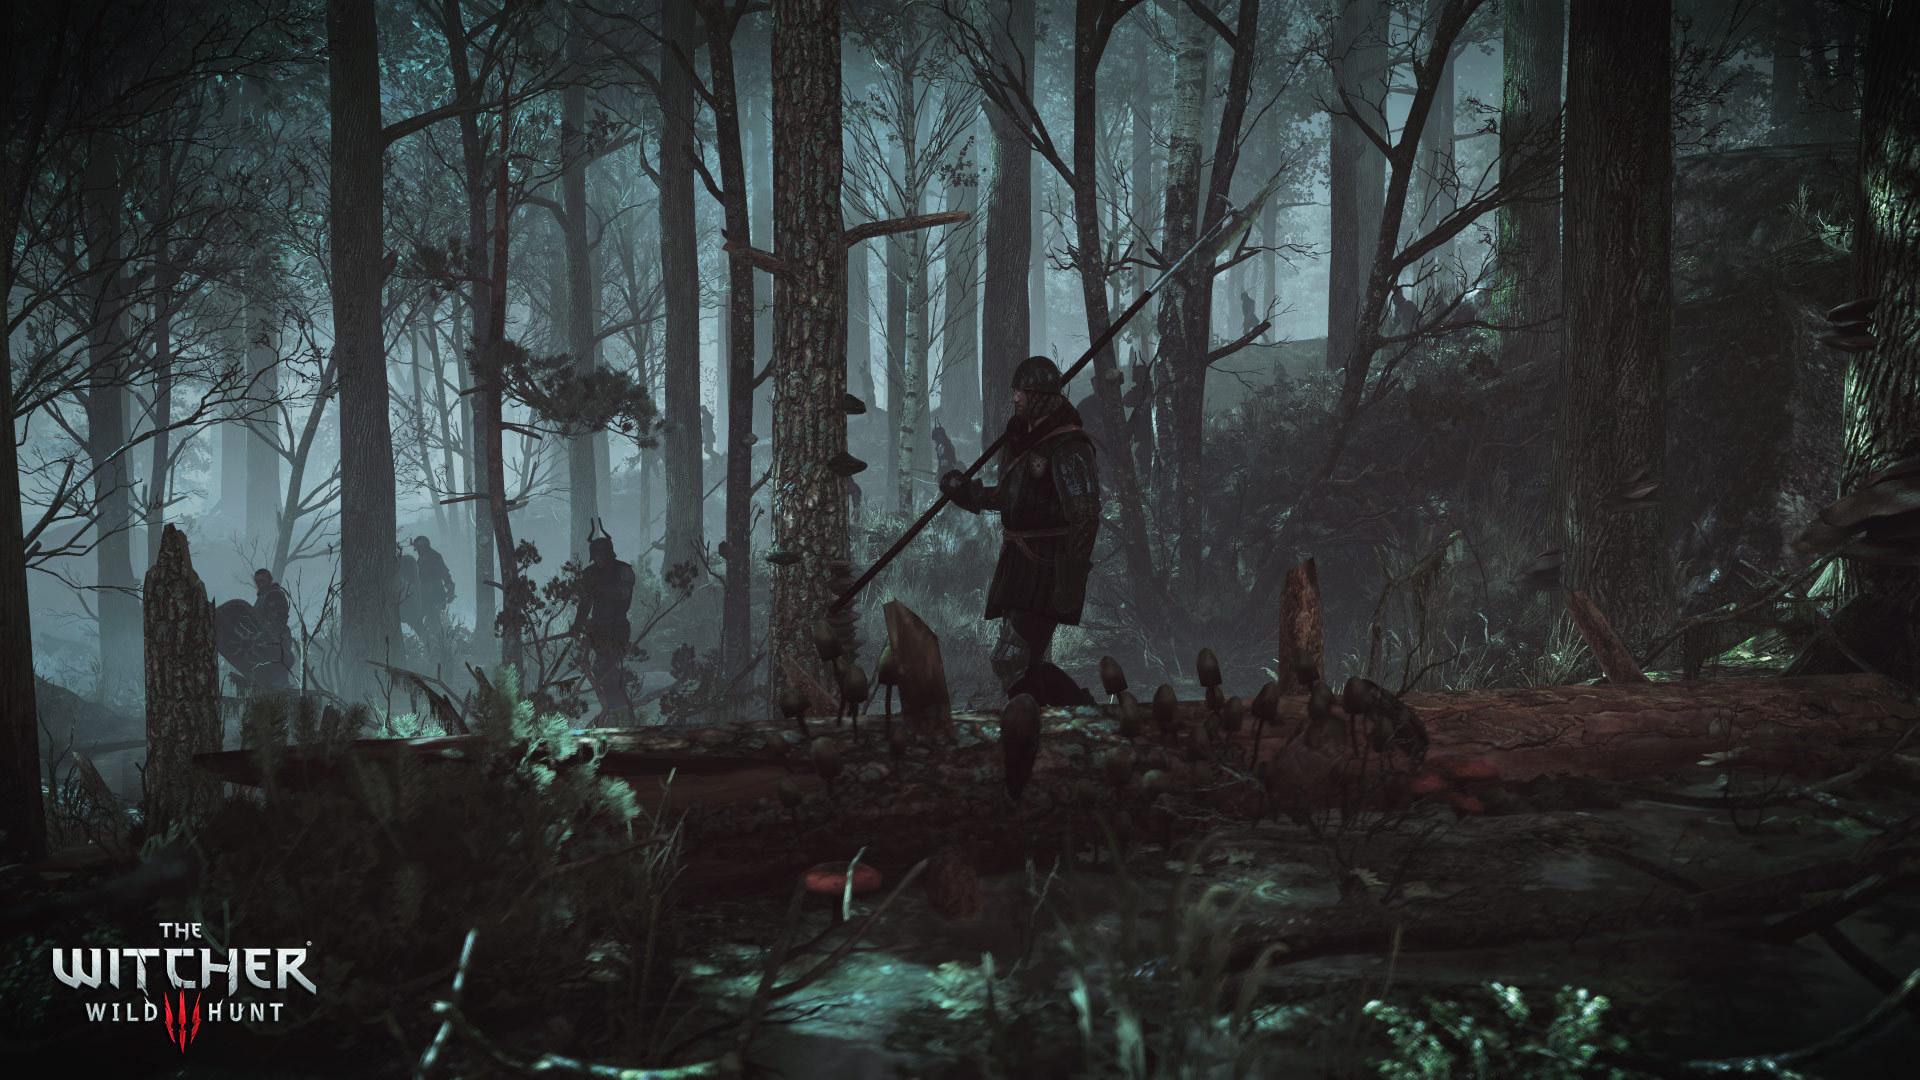 Witcher 3 release date in Brisbane